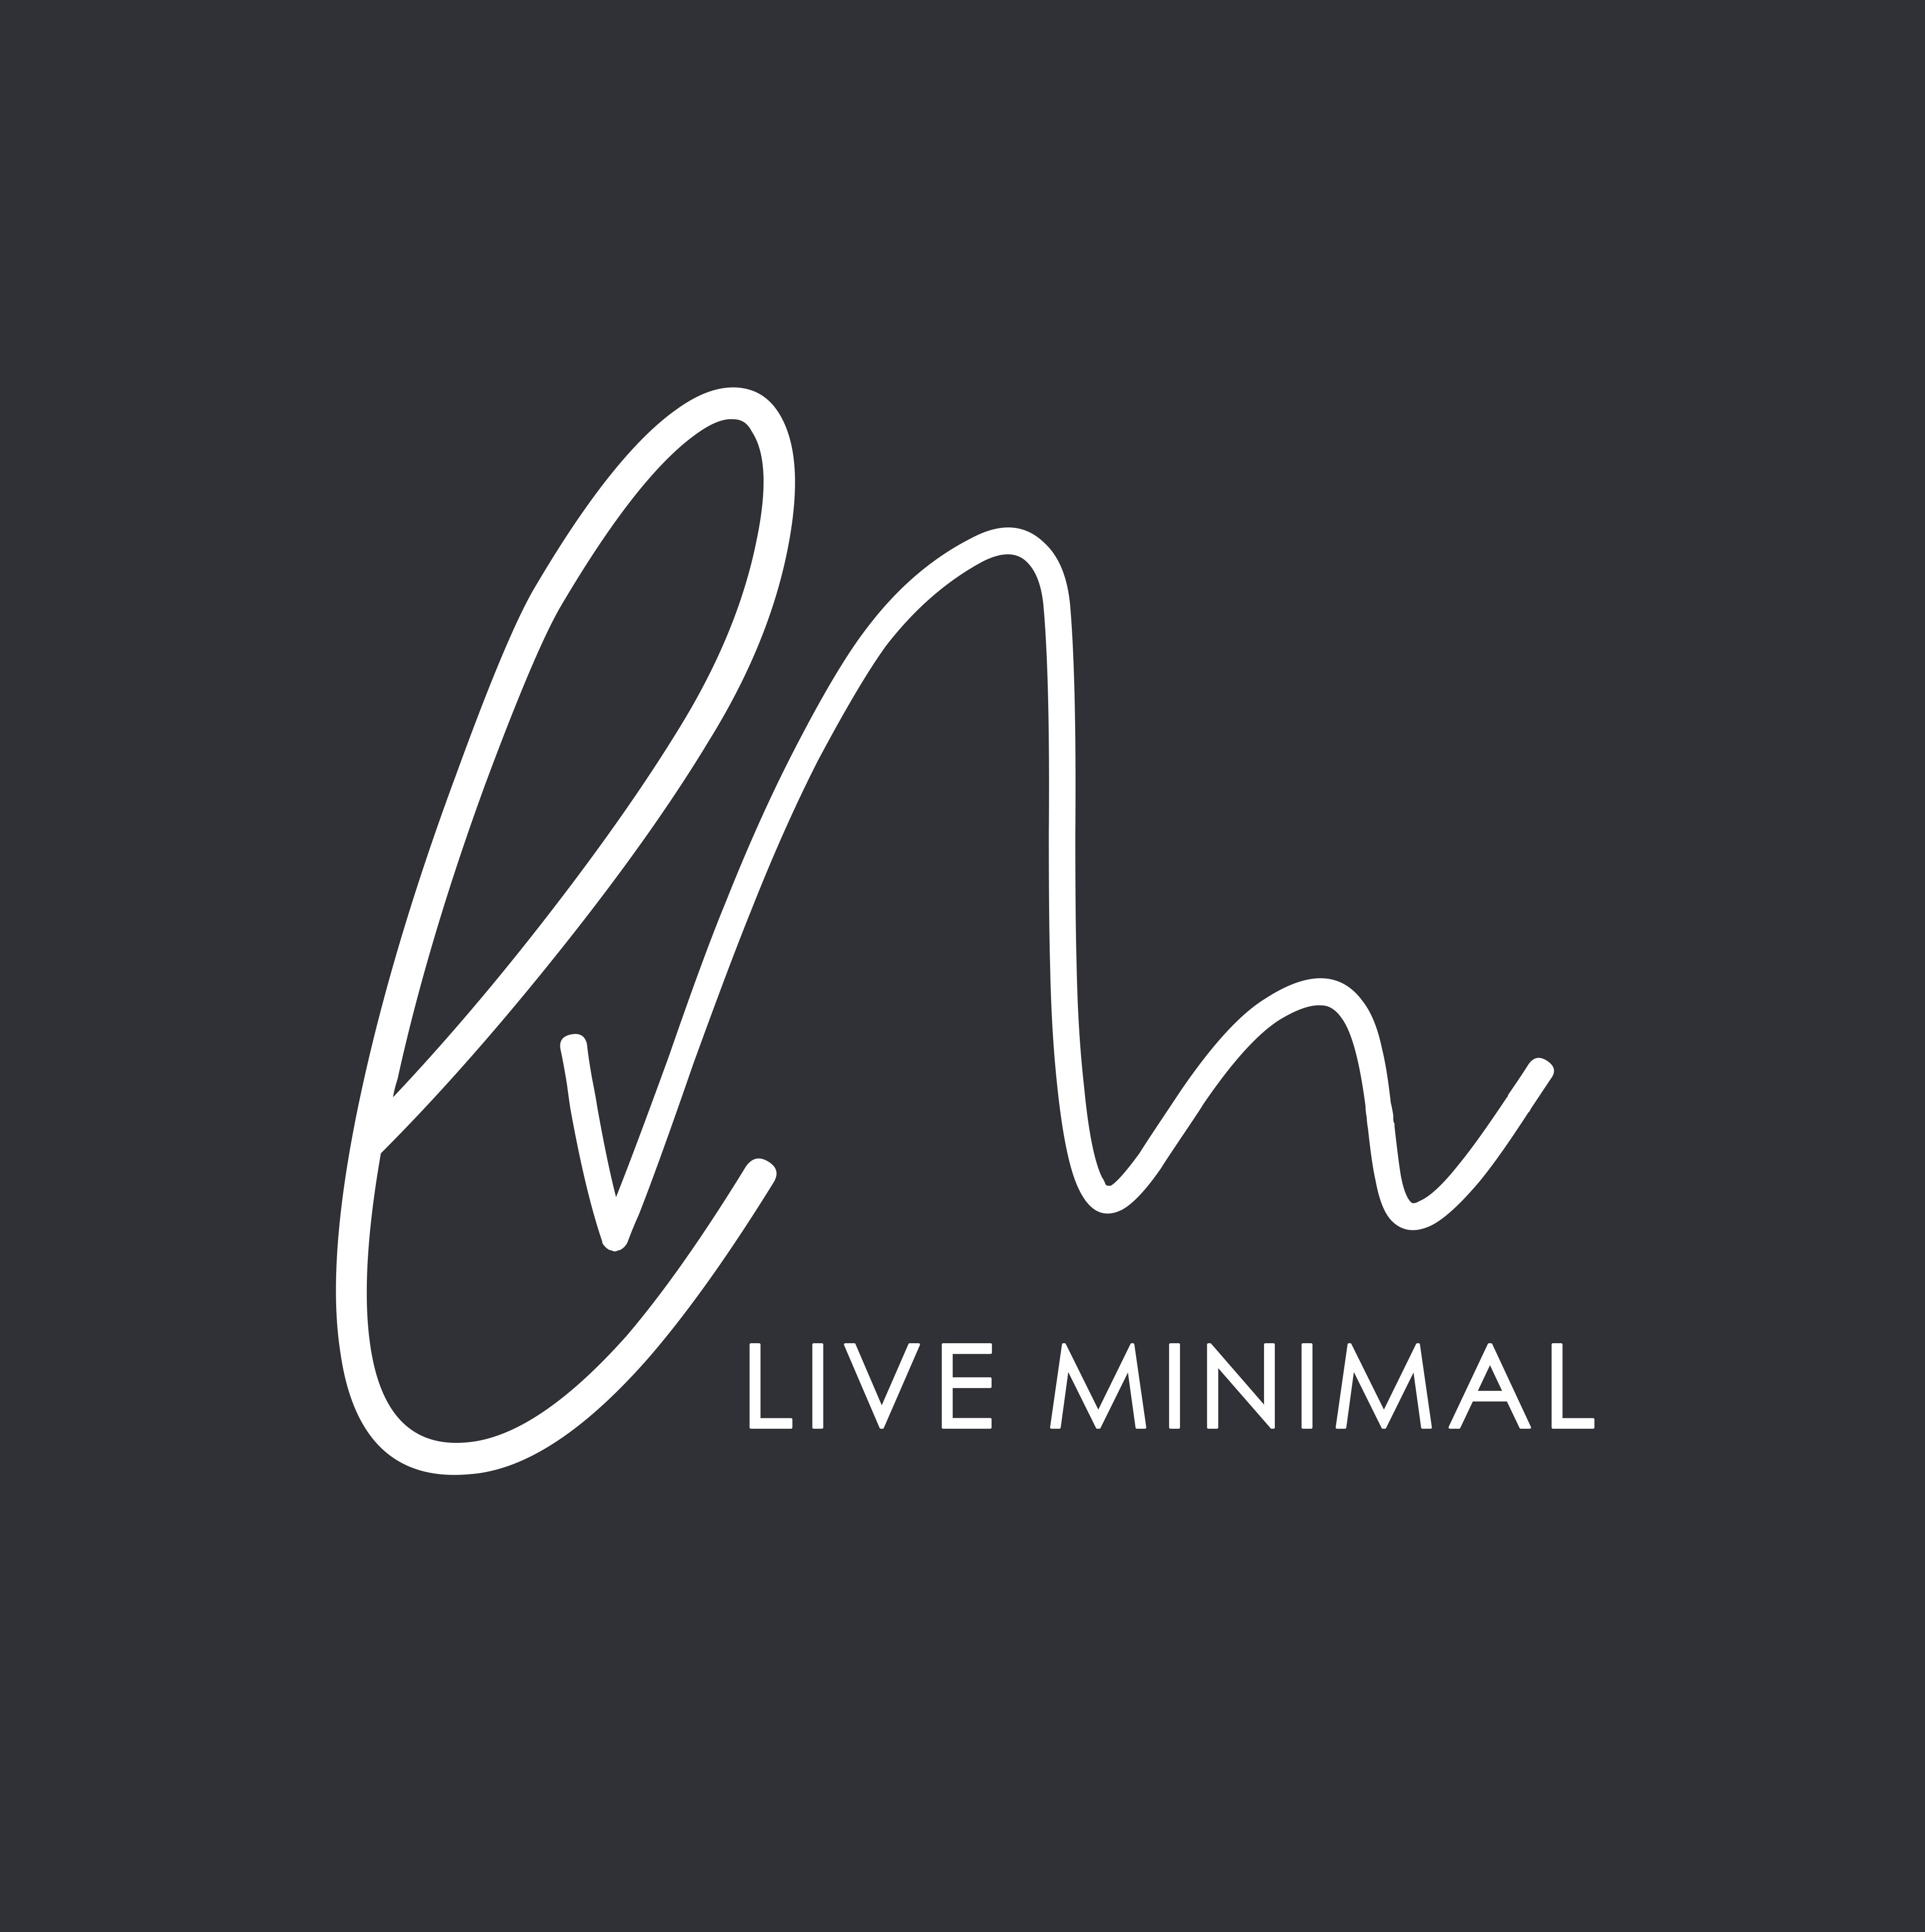 Live Minimal